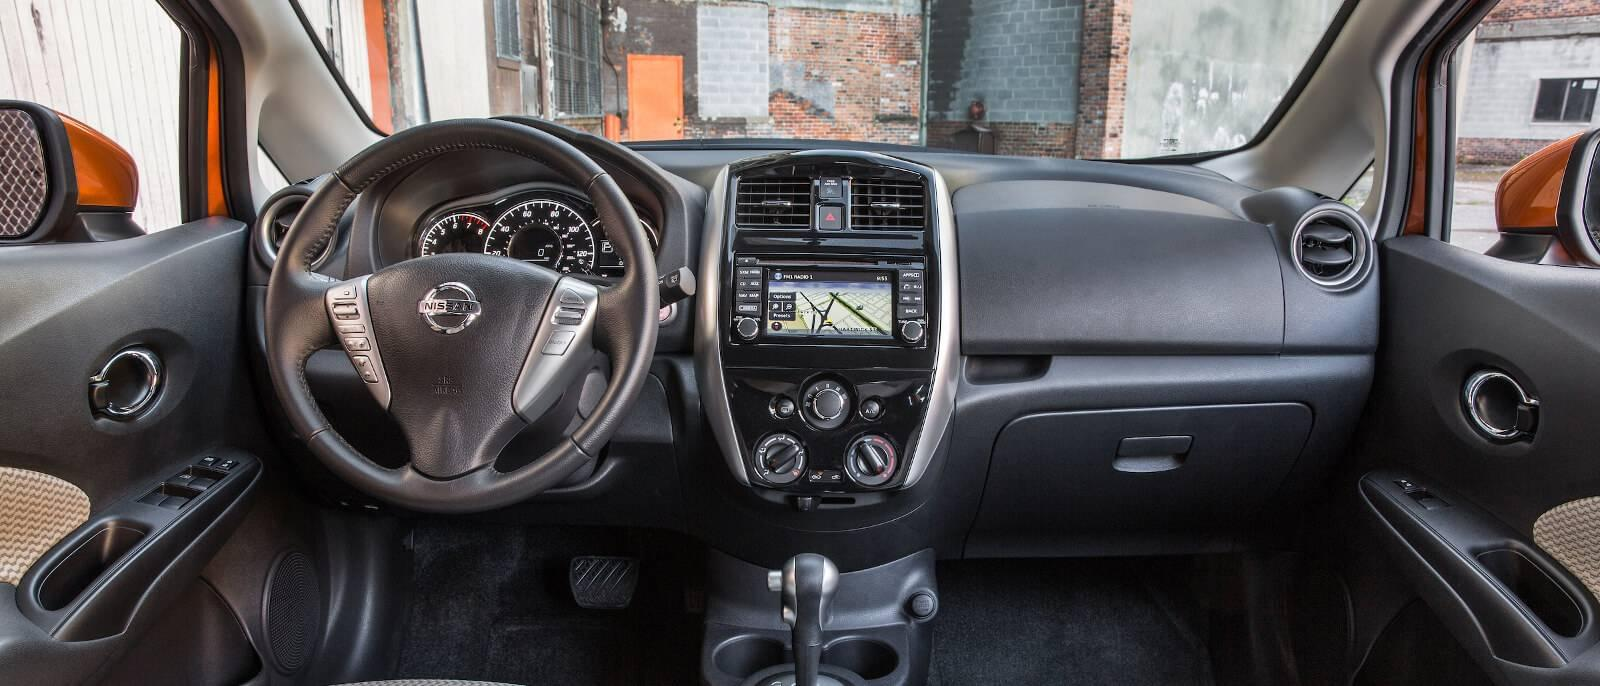 The 2017 nissan versa note awaits detroit at tamaroff nissan for Nissan versa note interior dimensions